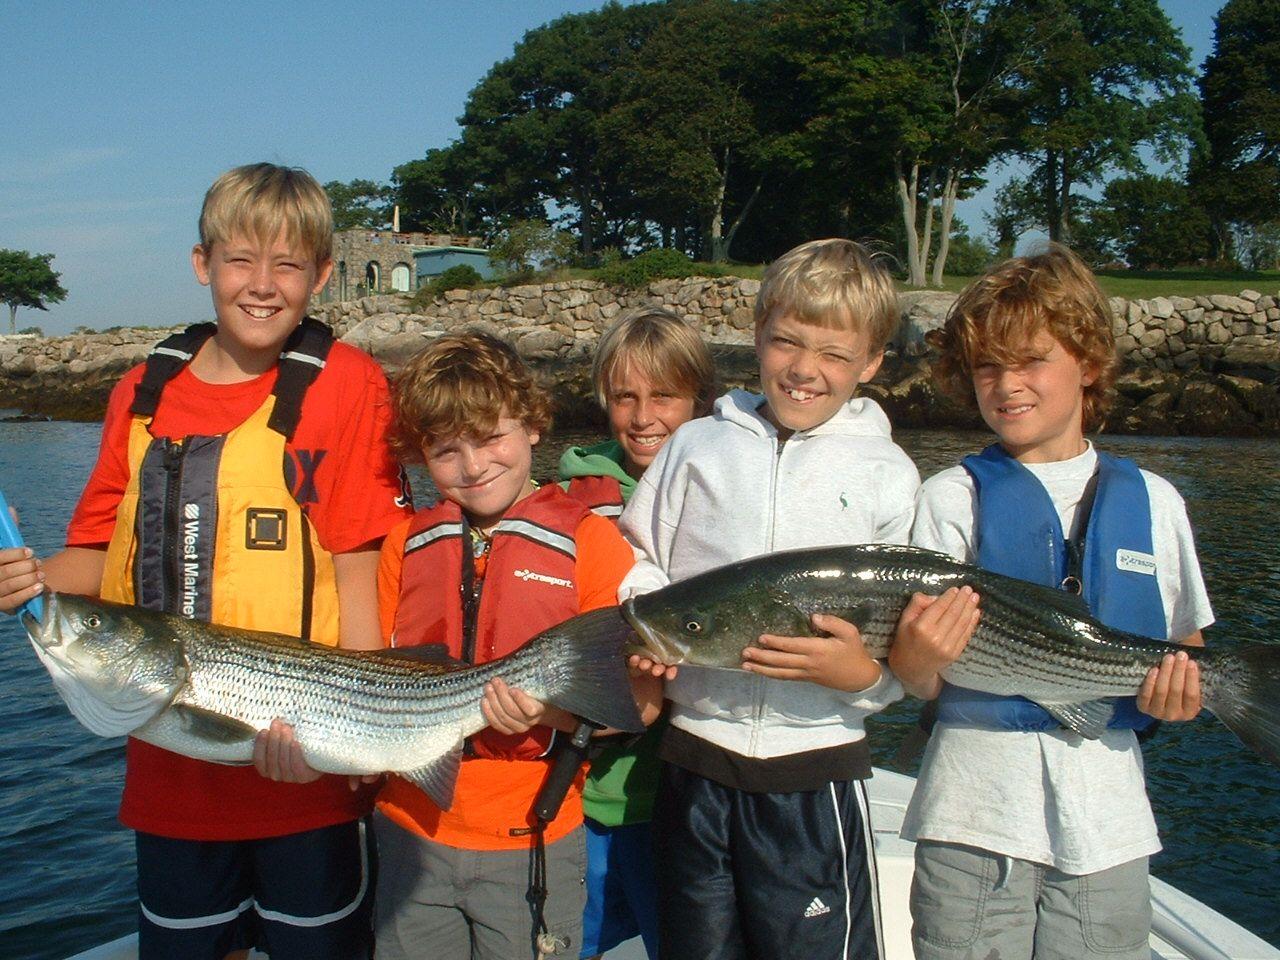 Fishing pics 083.jpg